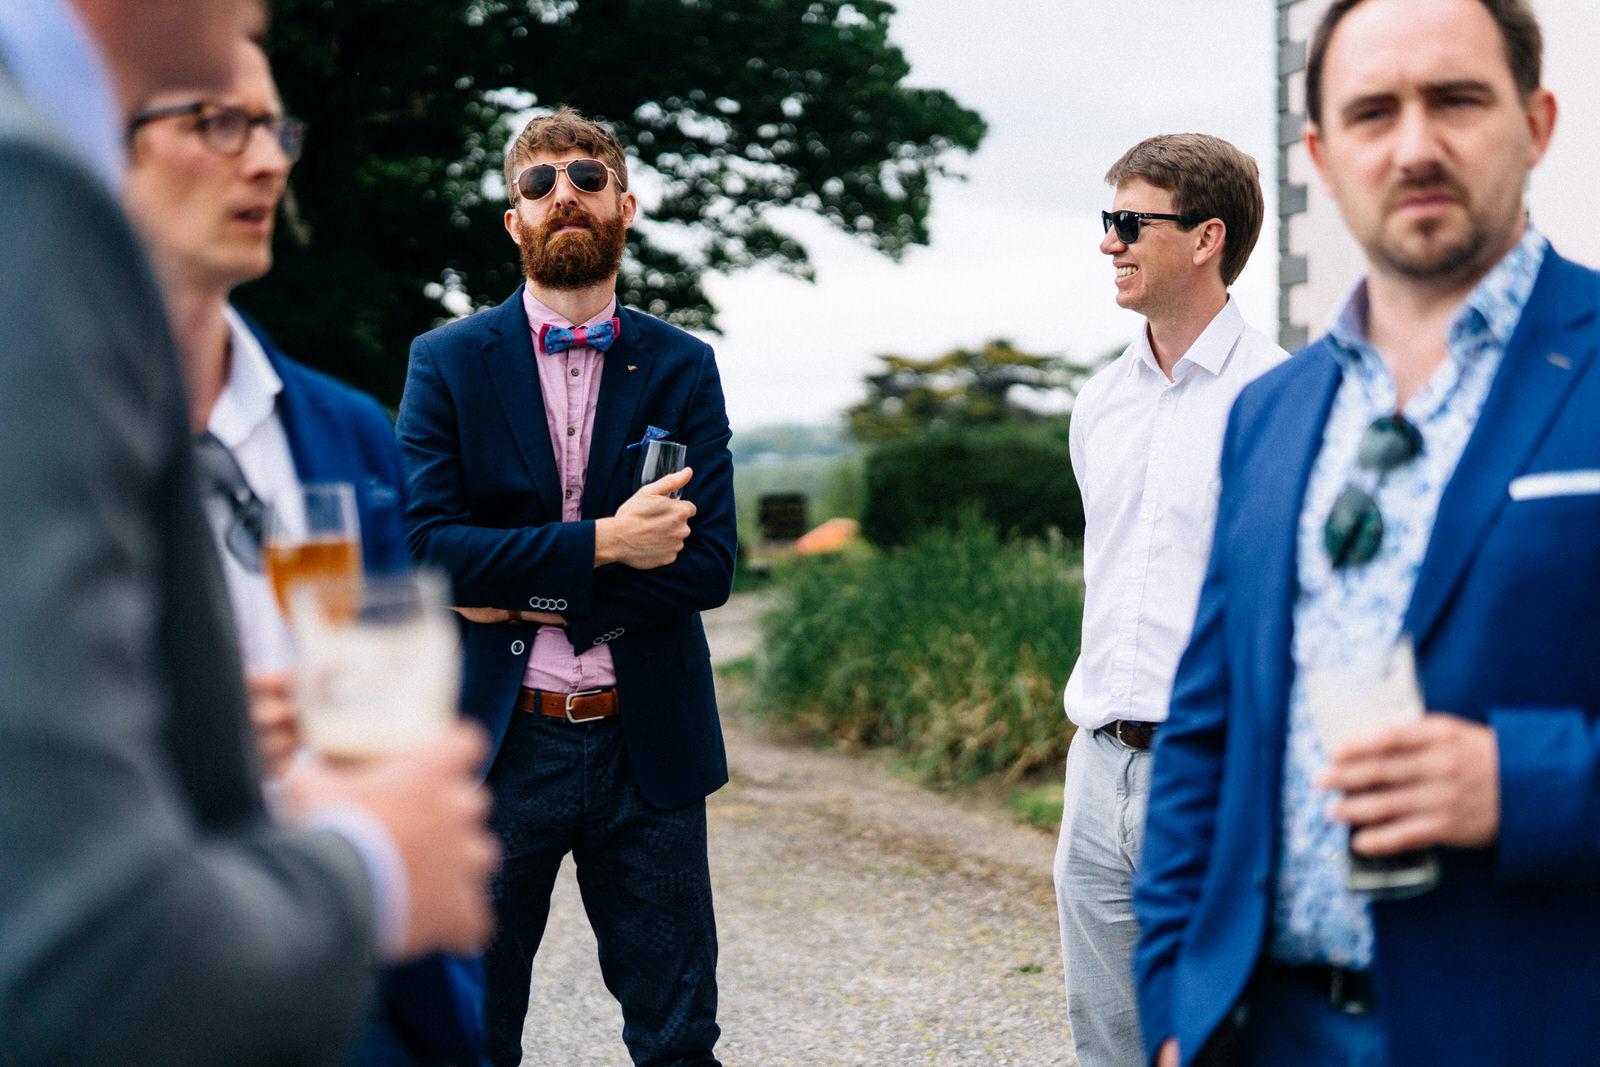 Cork documentary wedding photography 0123 122